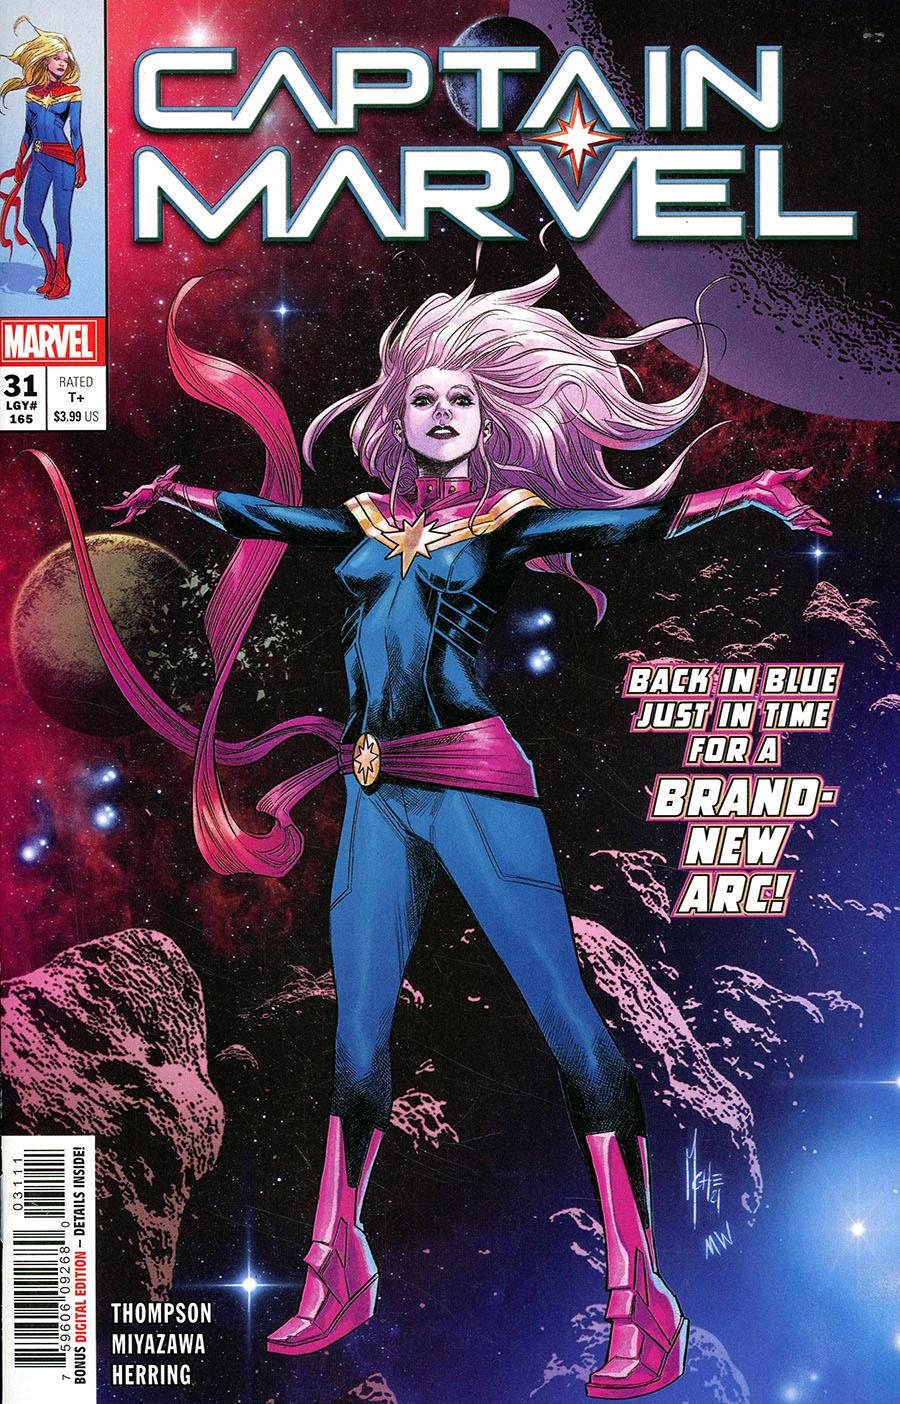 Captain Marvel Vol 9 #31 Cover A Regular Marco Checchetto Cover